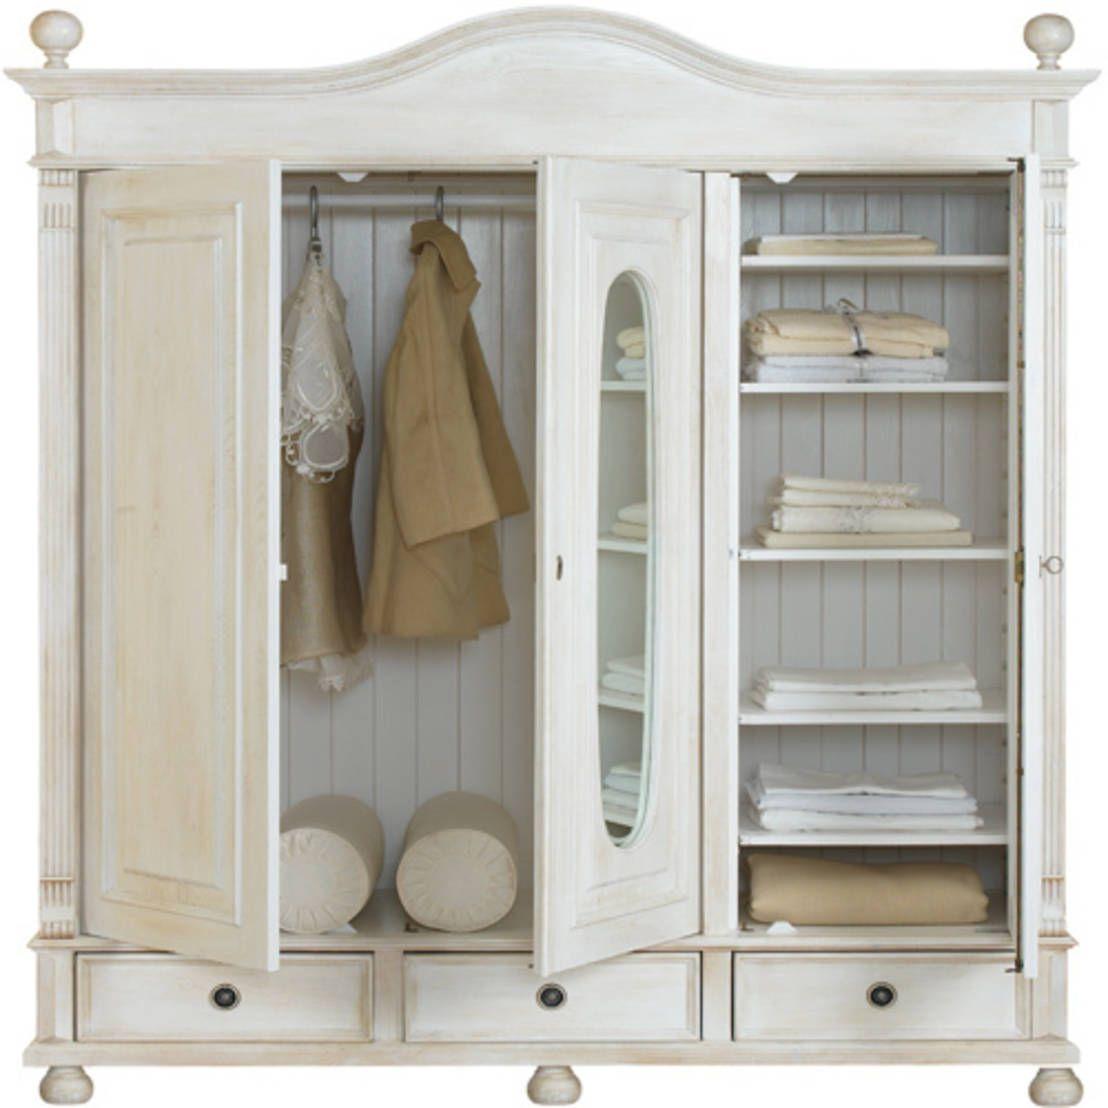 Nostalgische Mobel Wie Fruher Bei Oma Furniture Inspiration Furniture Home Decor